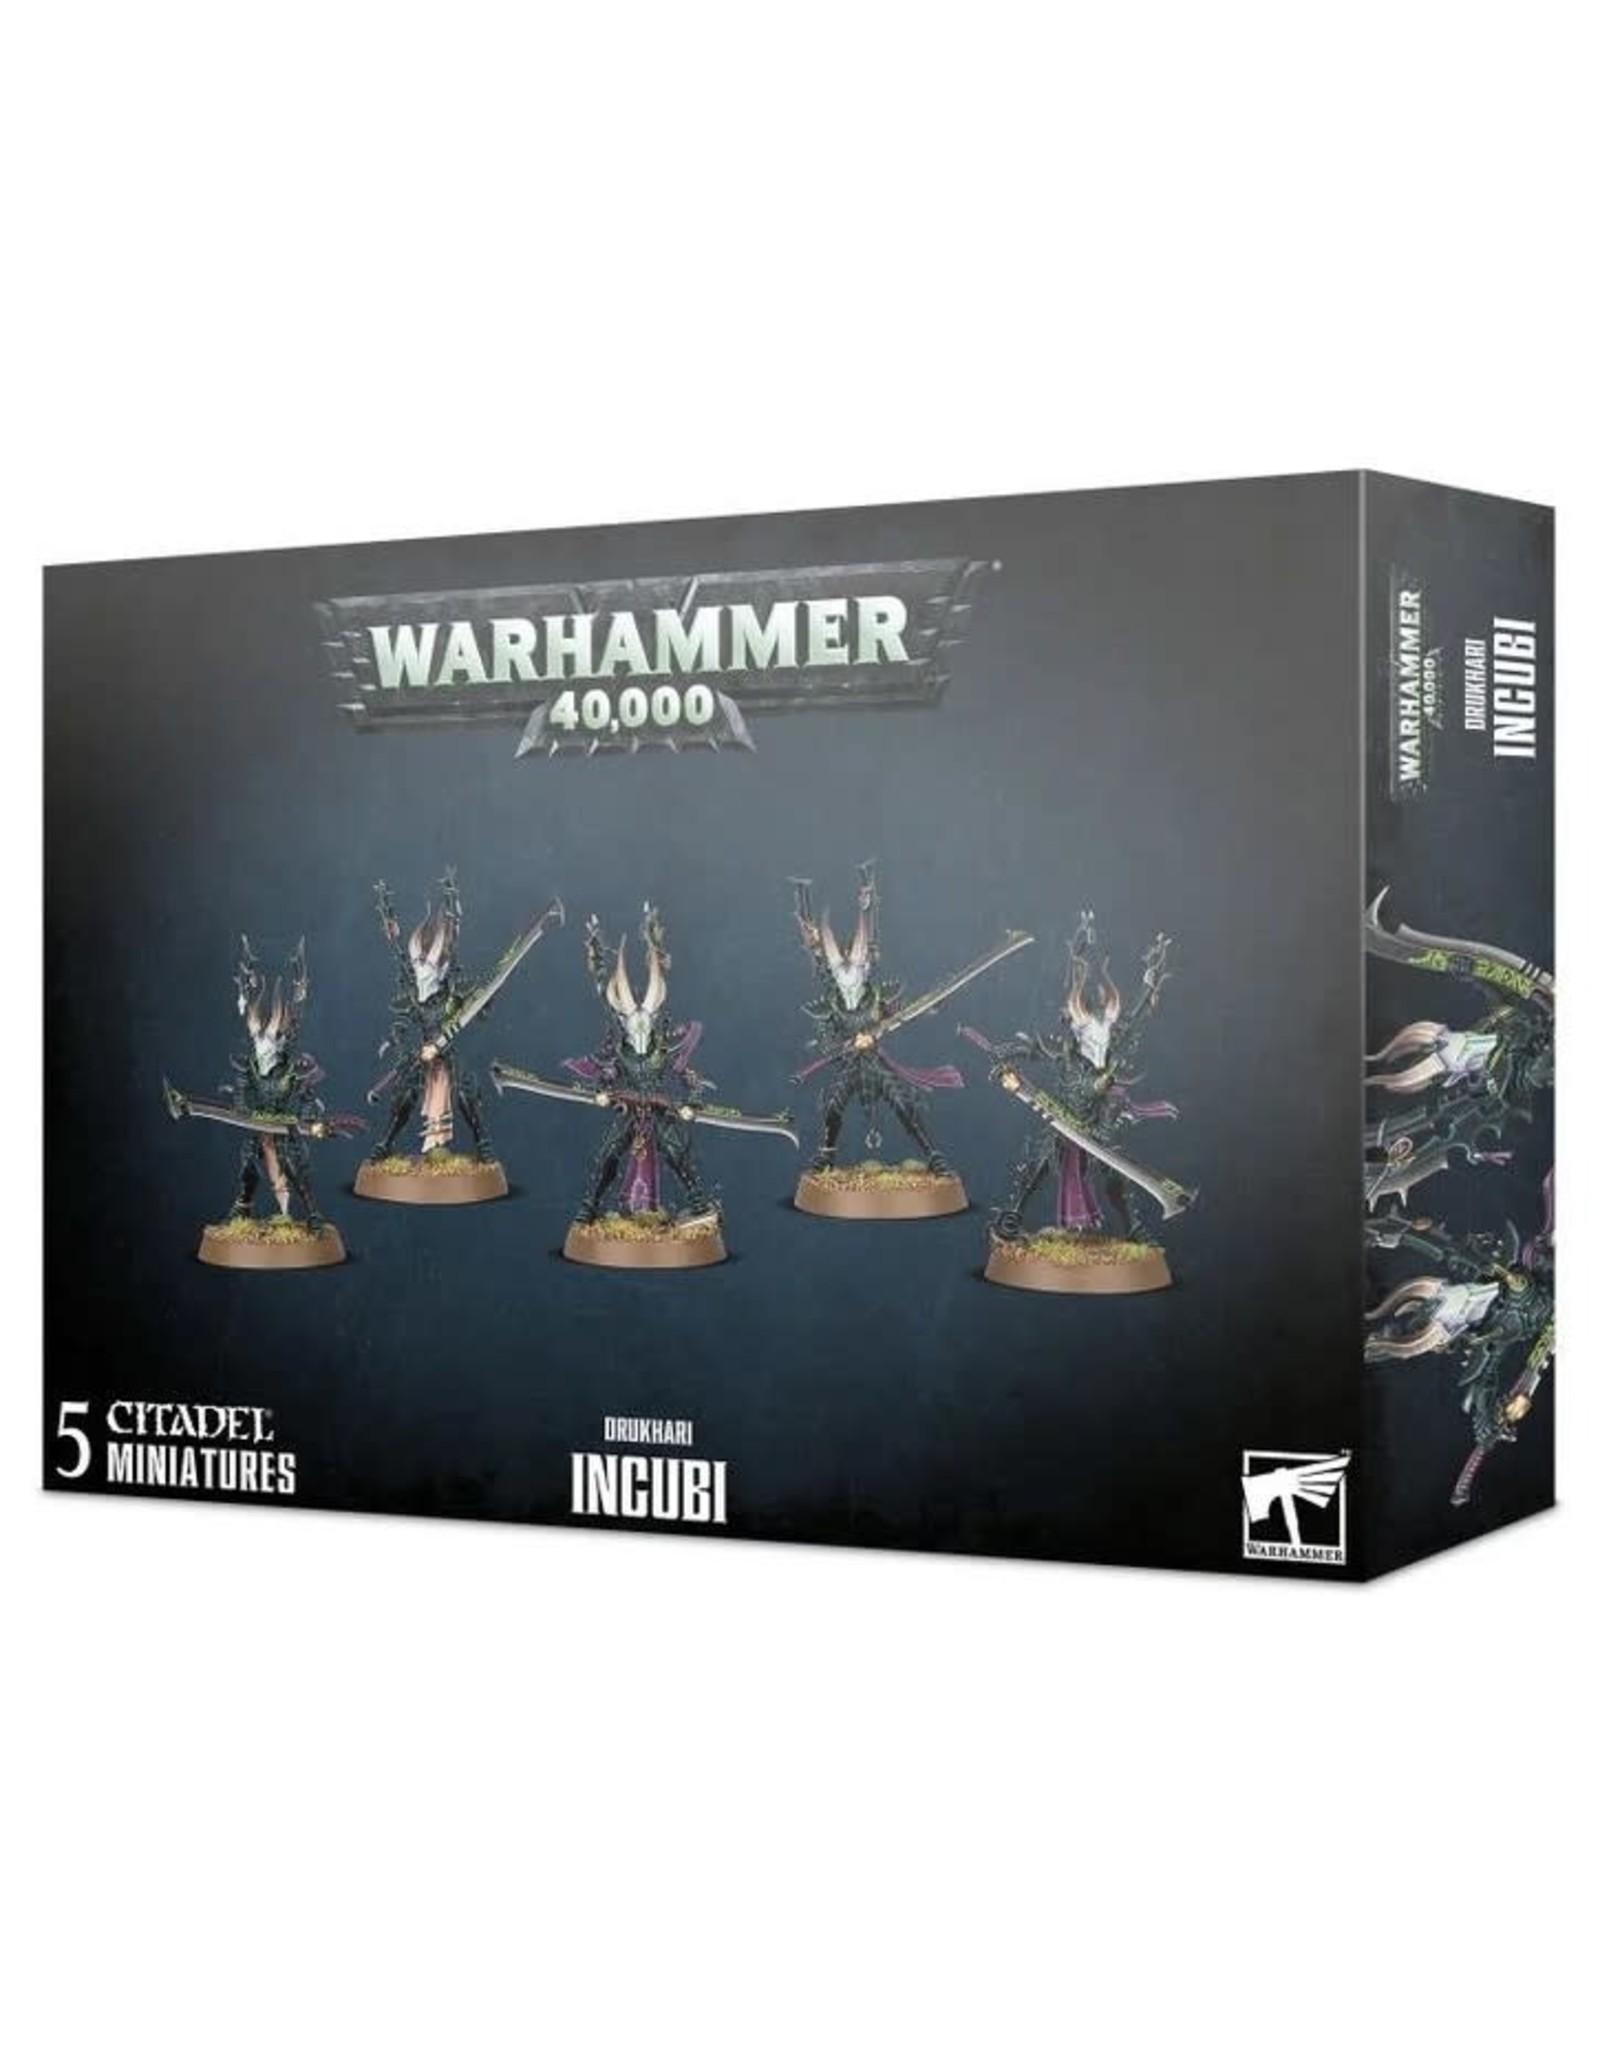 Warhammer 40K WH40K Drukhari Incubi